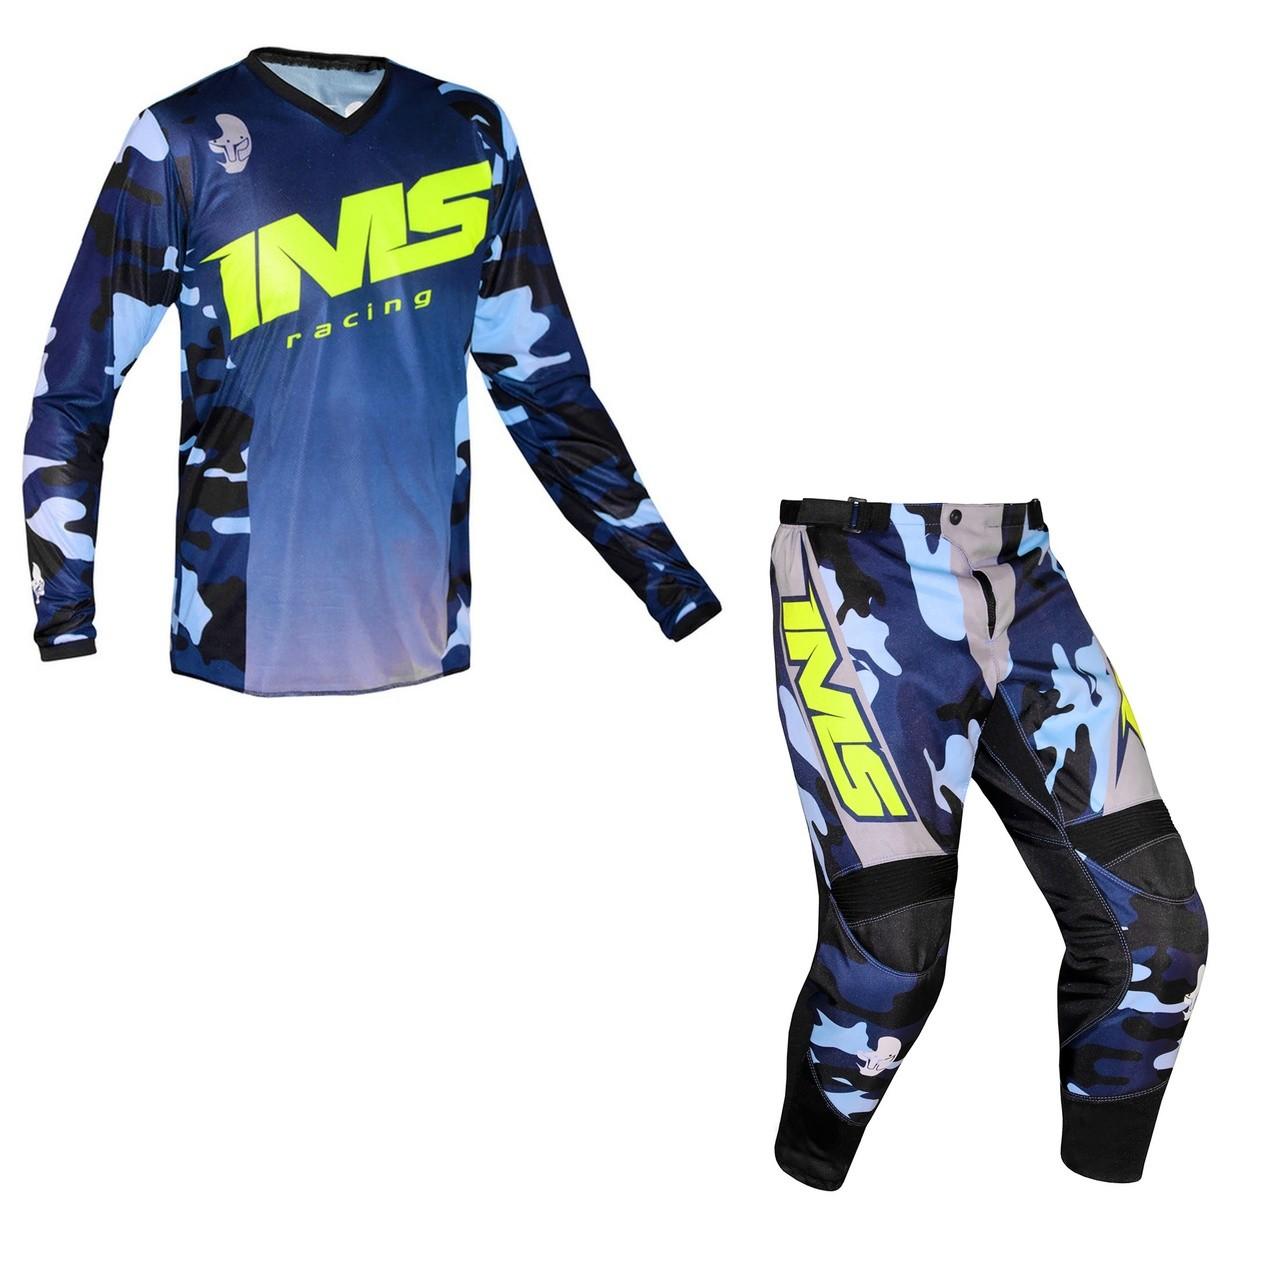 Kit Calça + Camisa IMS Army - Camo Azul